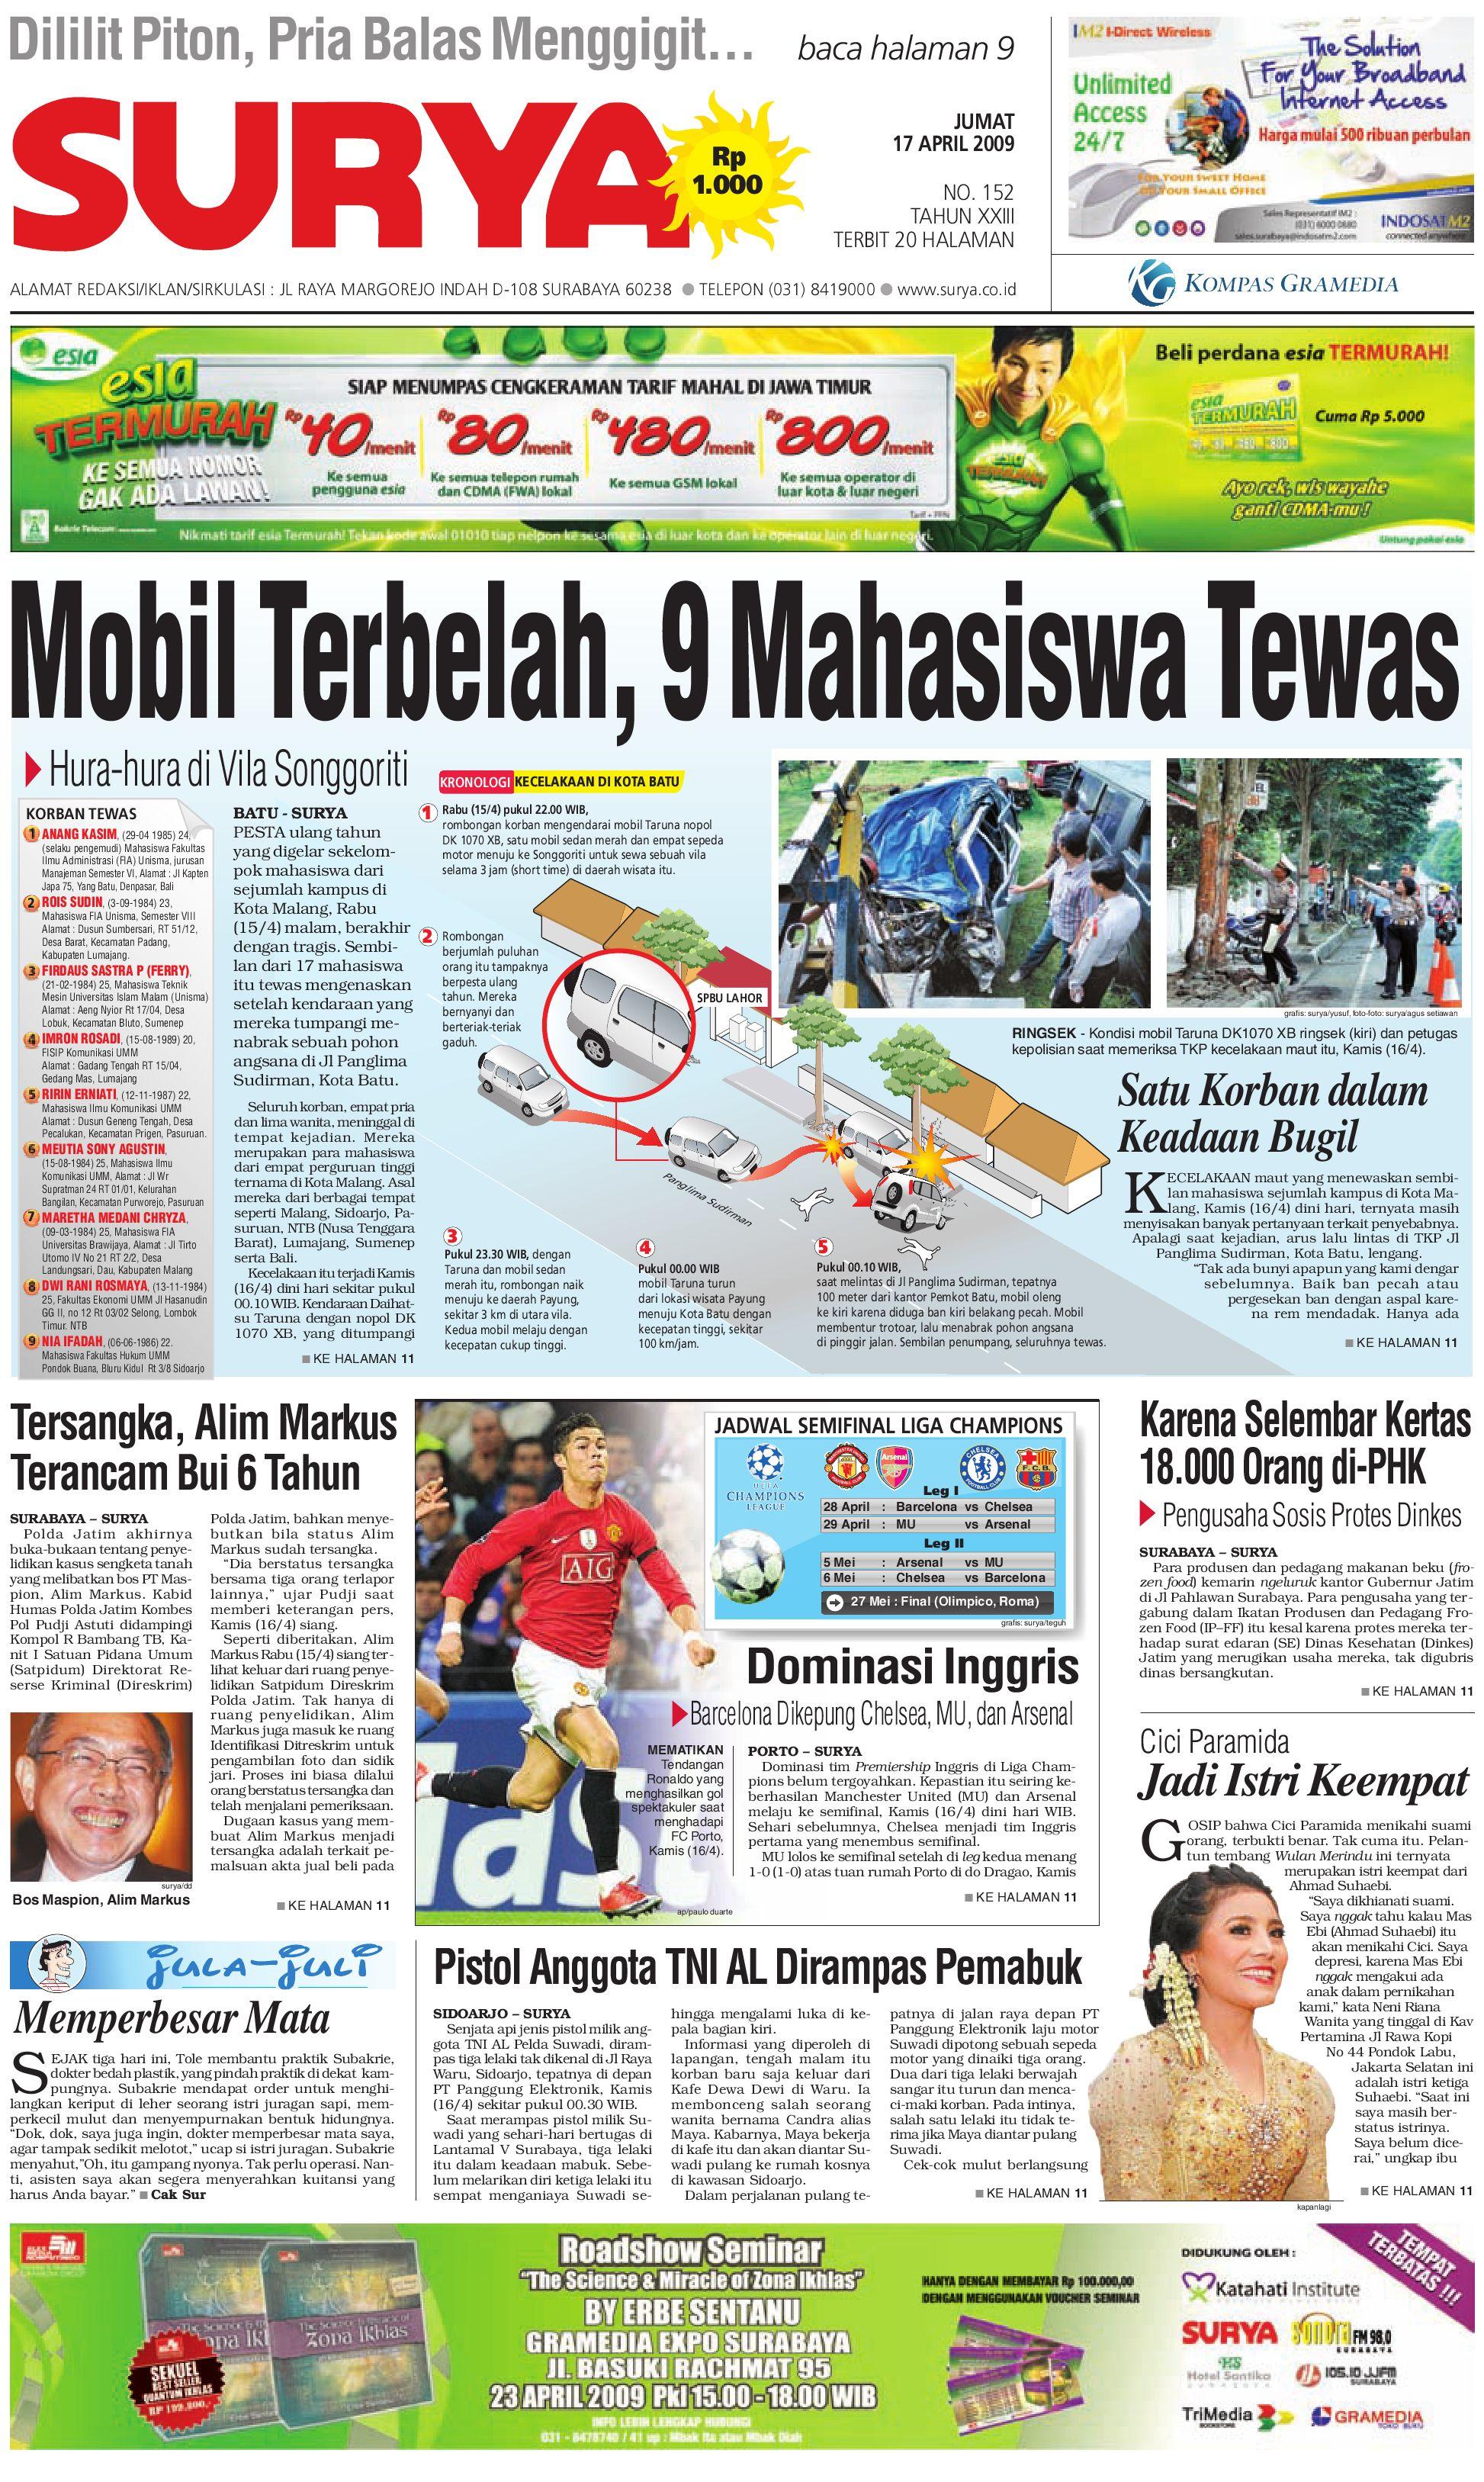 Surya Edisi Cetak 17 April 2009 by Harian SURYA - issuu 87b026b6ee